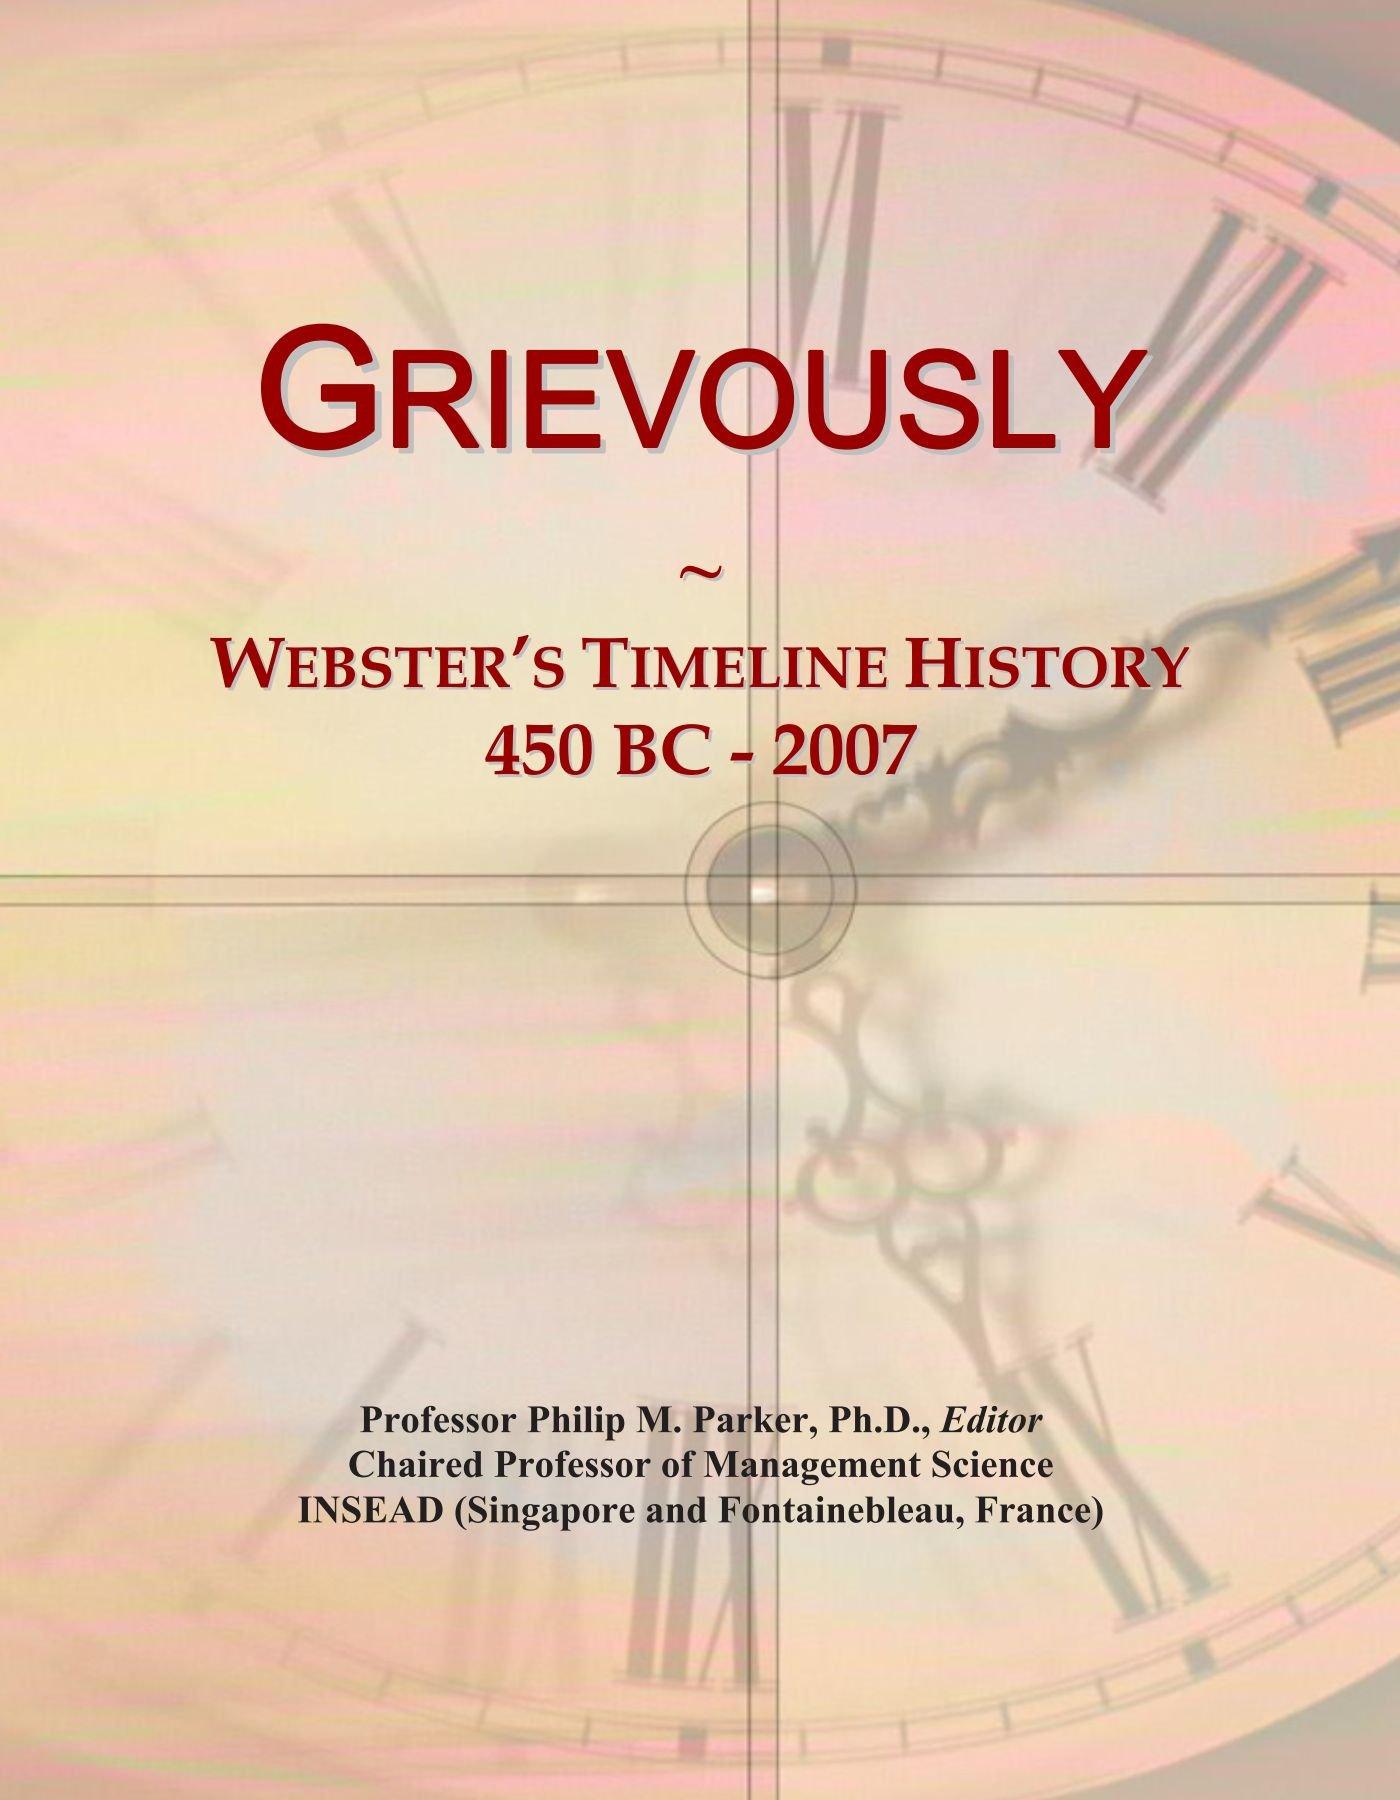 Grievously: Webster's Timeline History, 450 BC - 2007 pdf